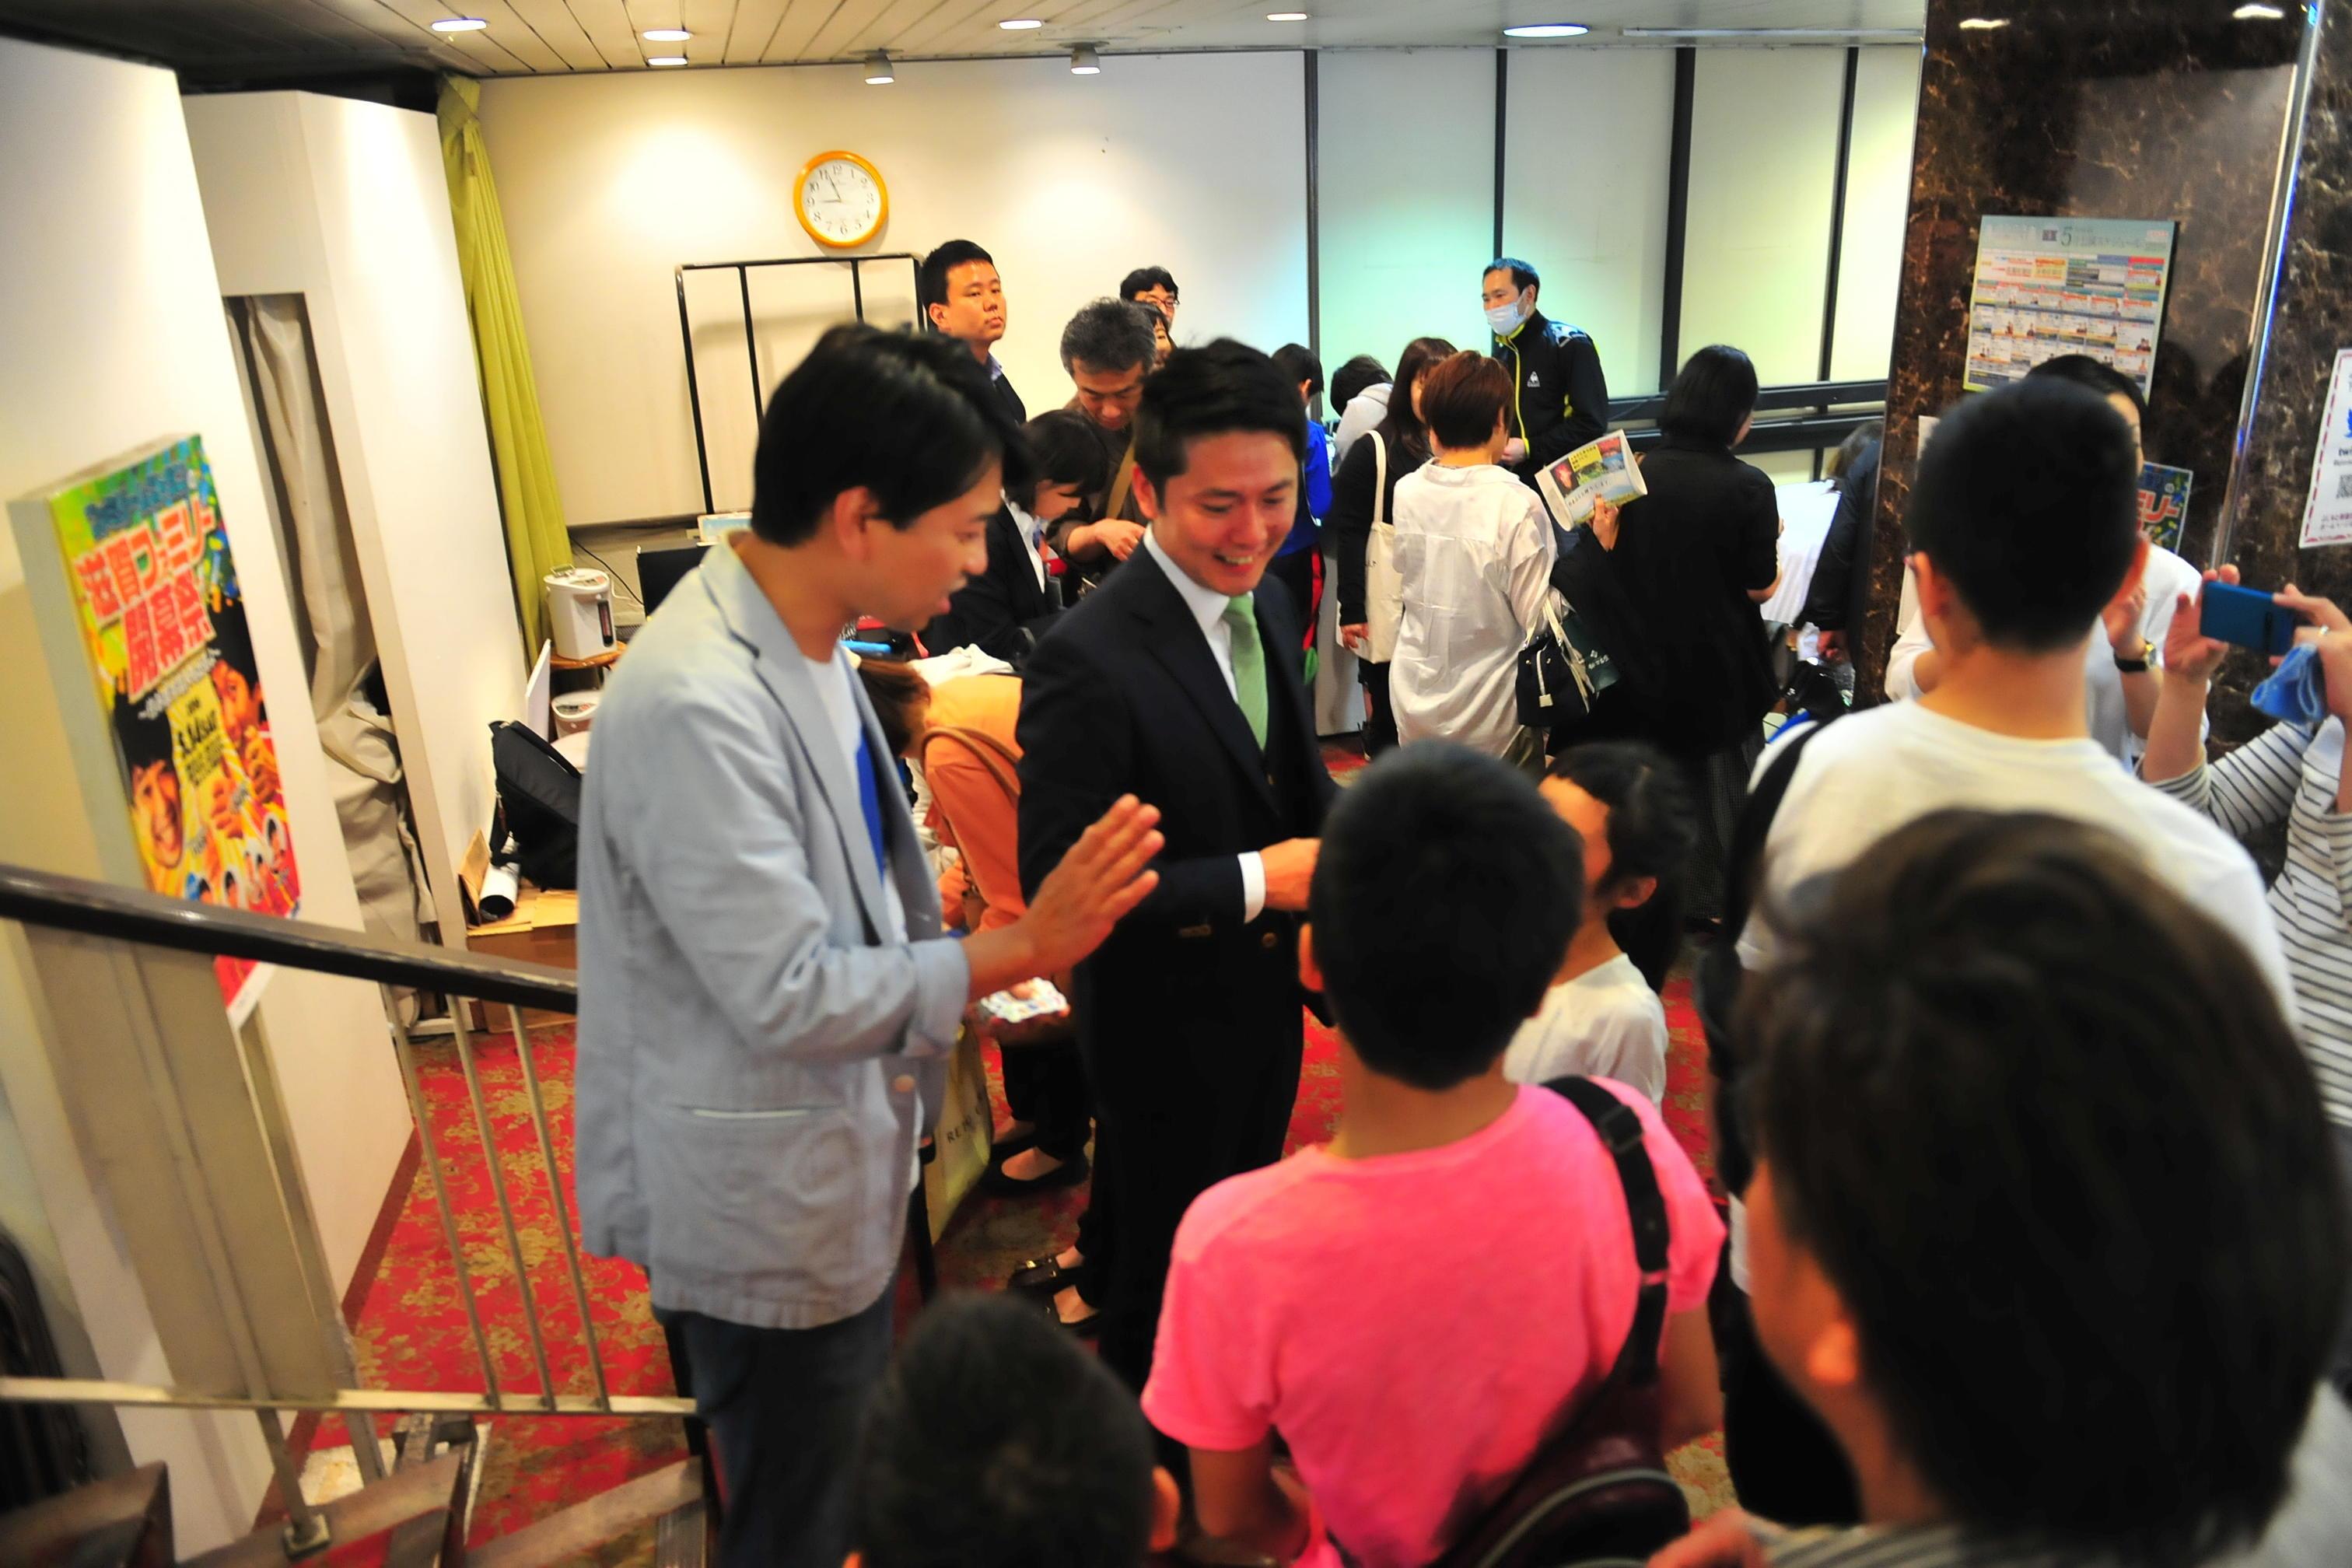 http://news.yoshimoto.co.jp/20160516145055-0fe6a4db0fd30de1fe12c60bc8465eafcb49f365.jpg